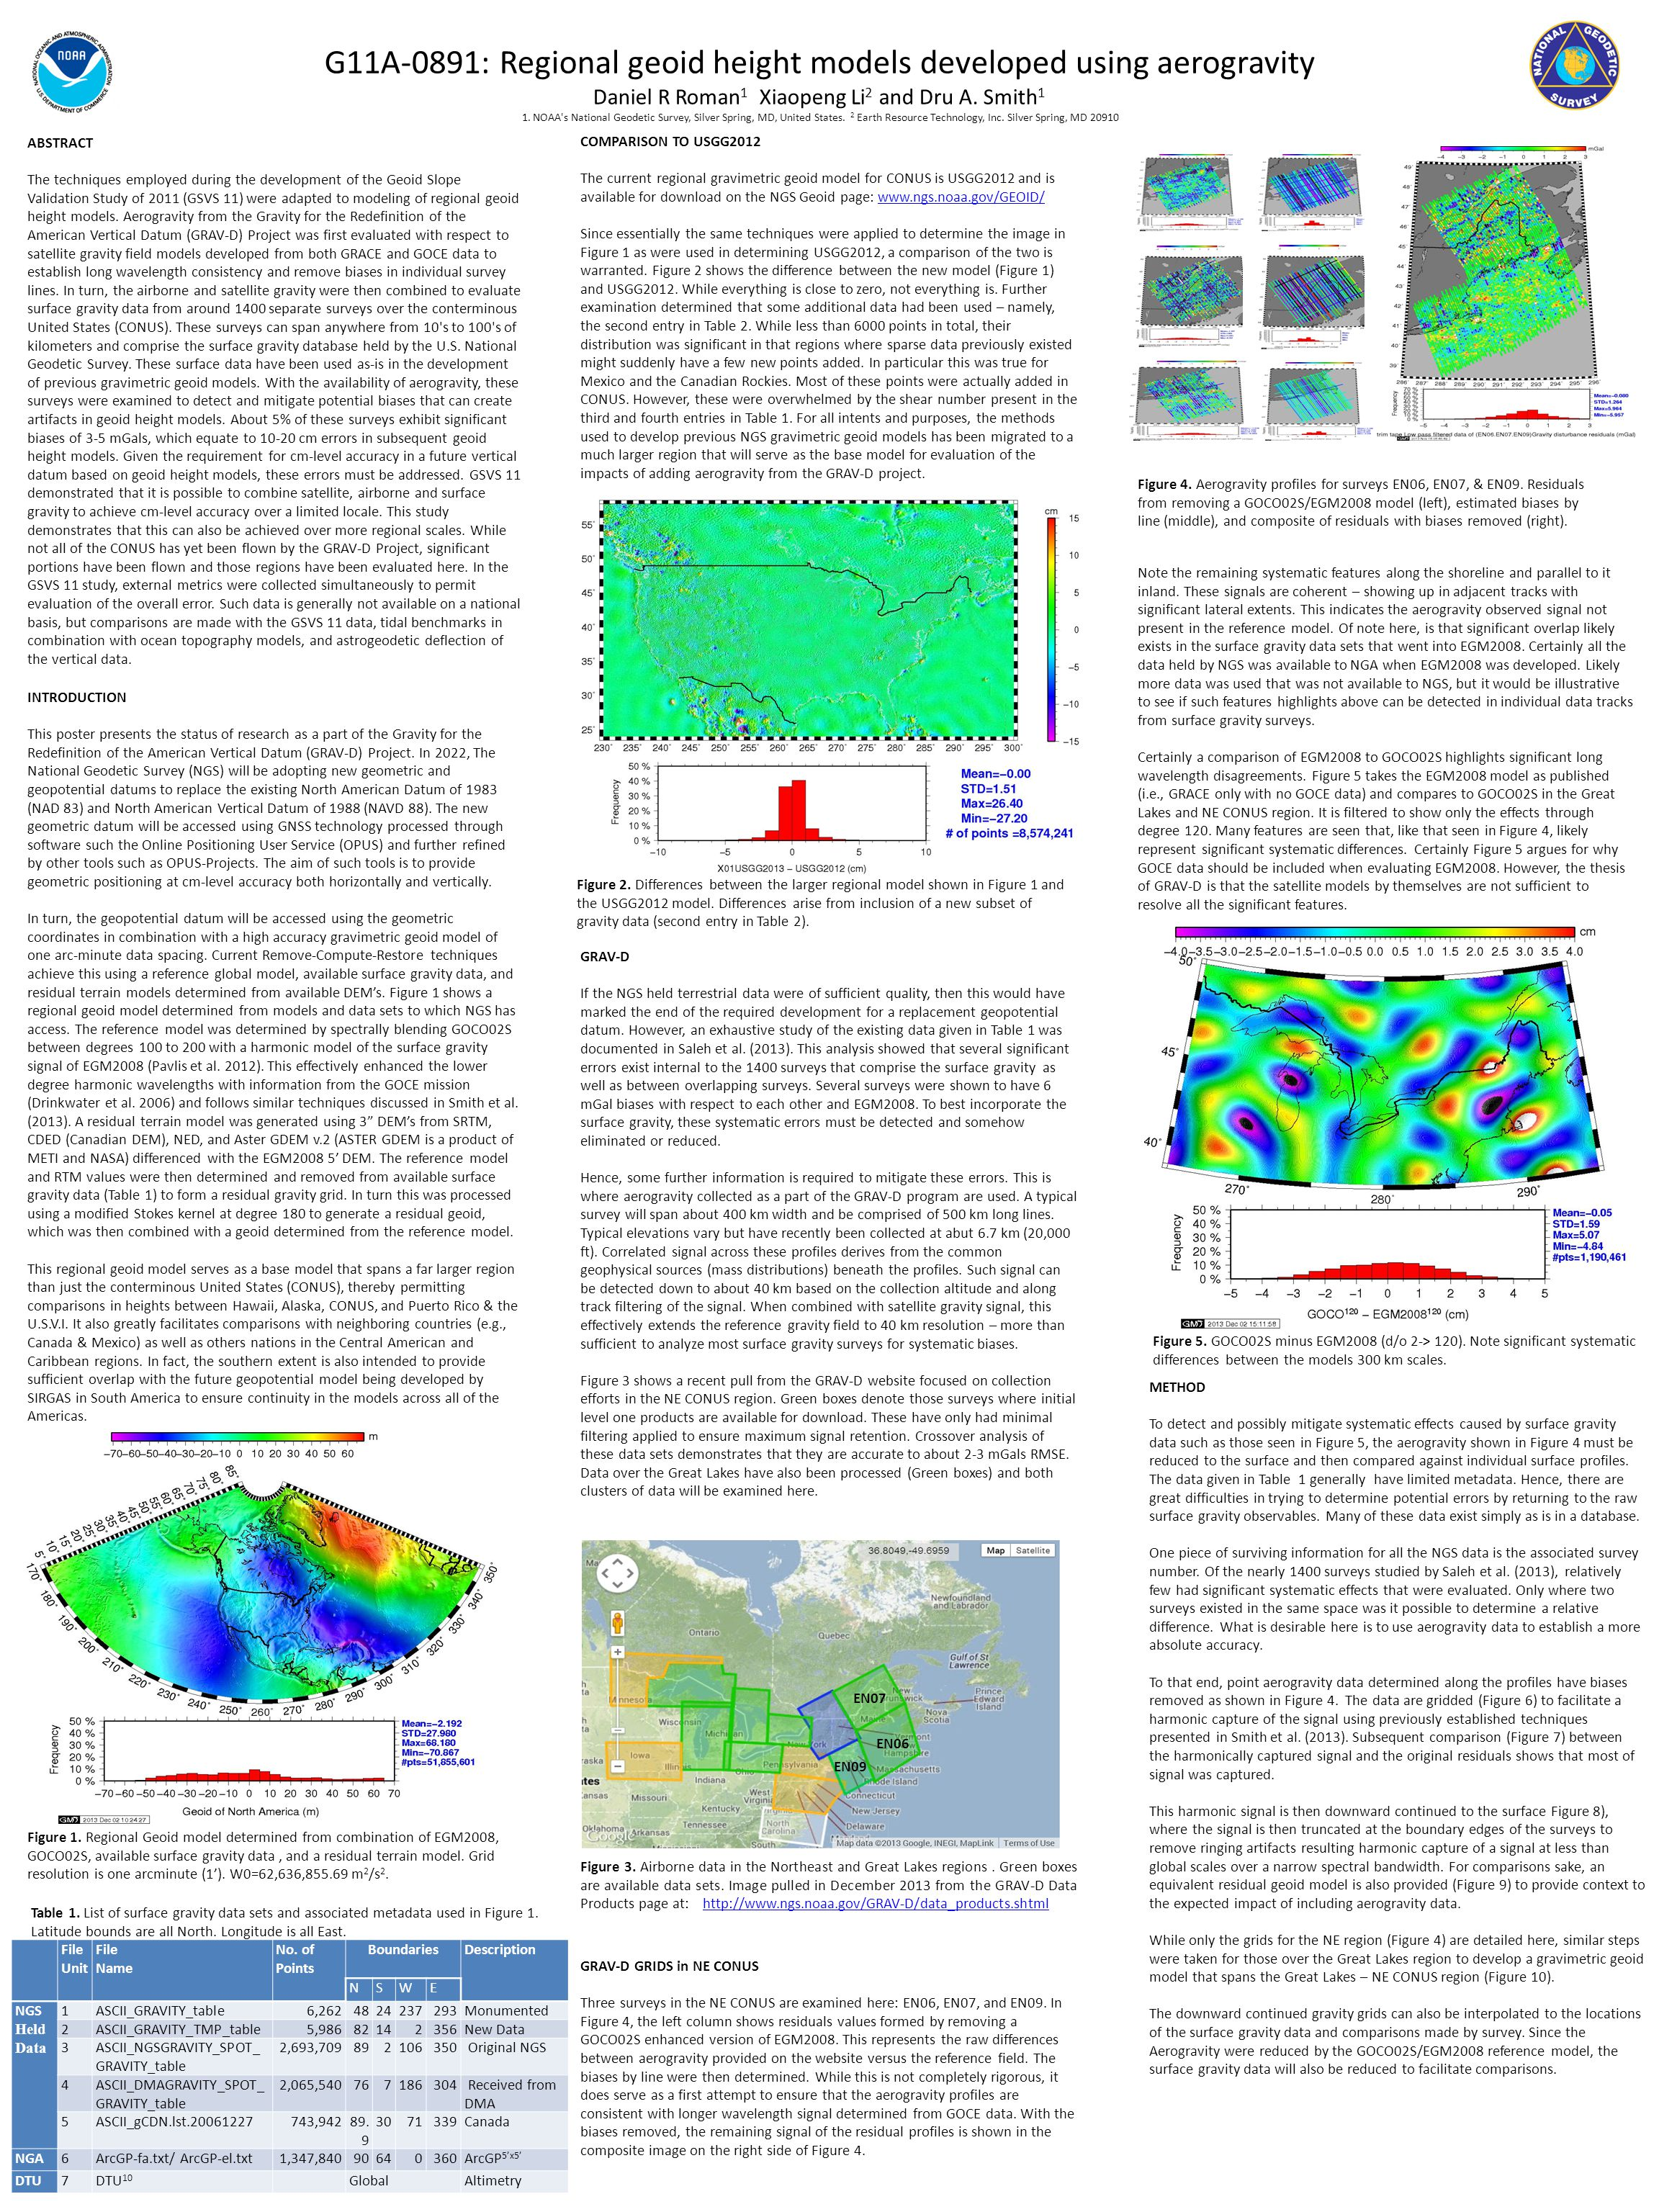 G11A-0891: Regional geoid height models developed using aerogravity Daniel R Roman 1 Xiaopeng Li 2 and Dru A.